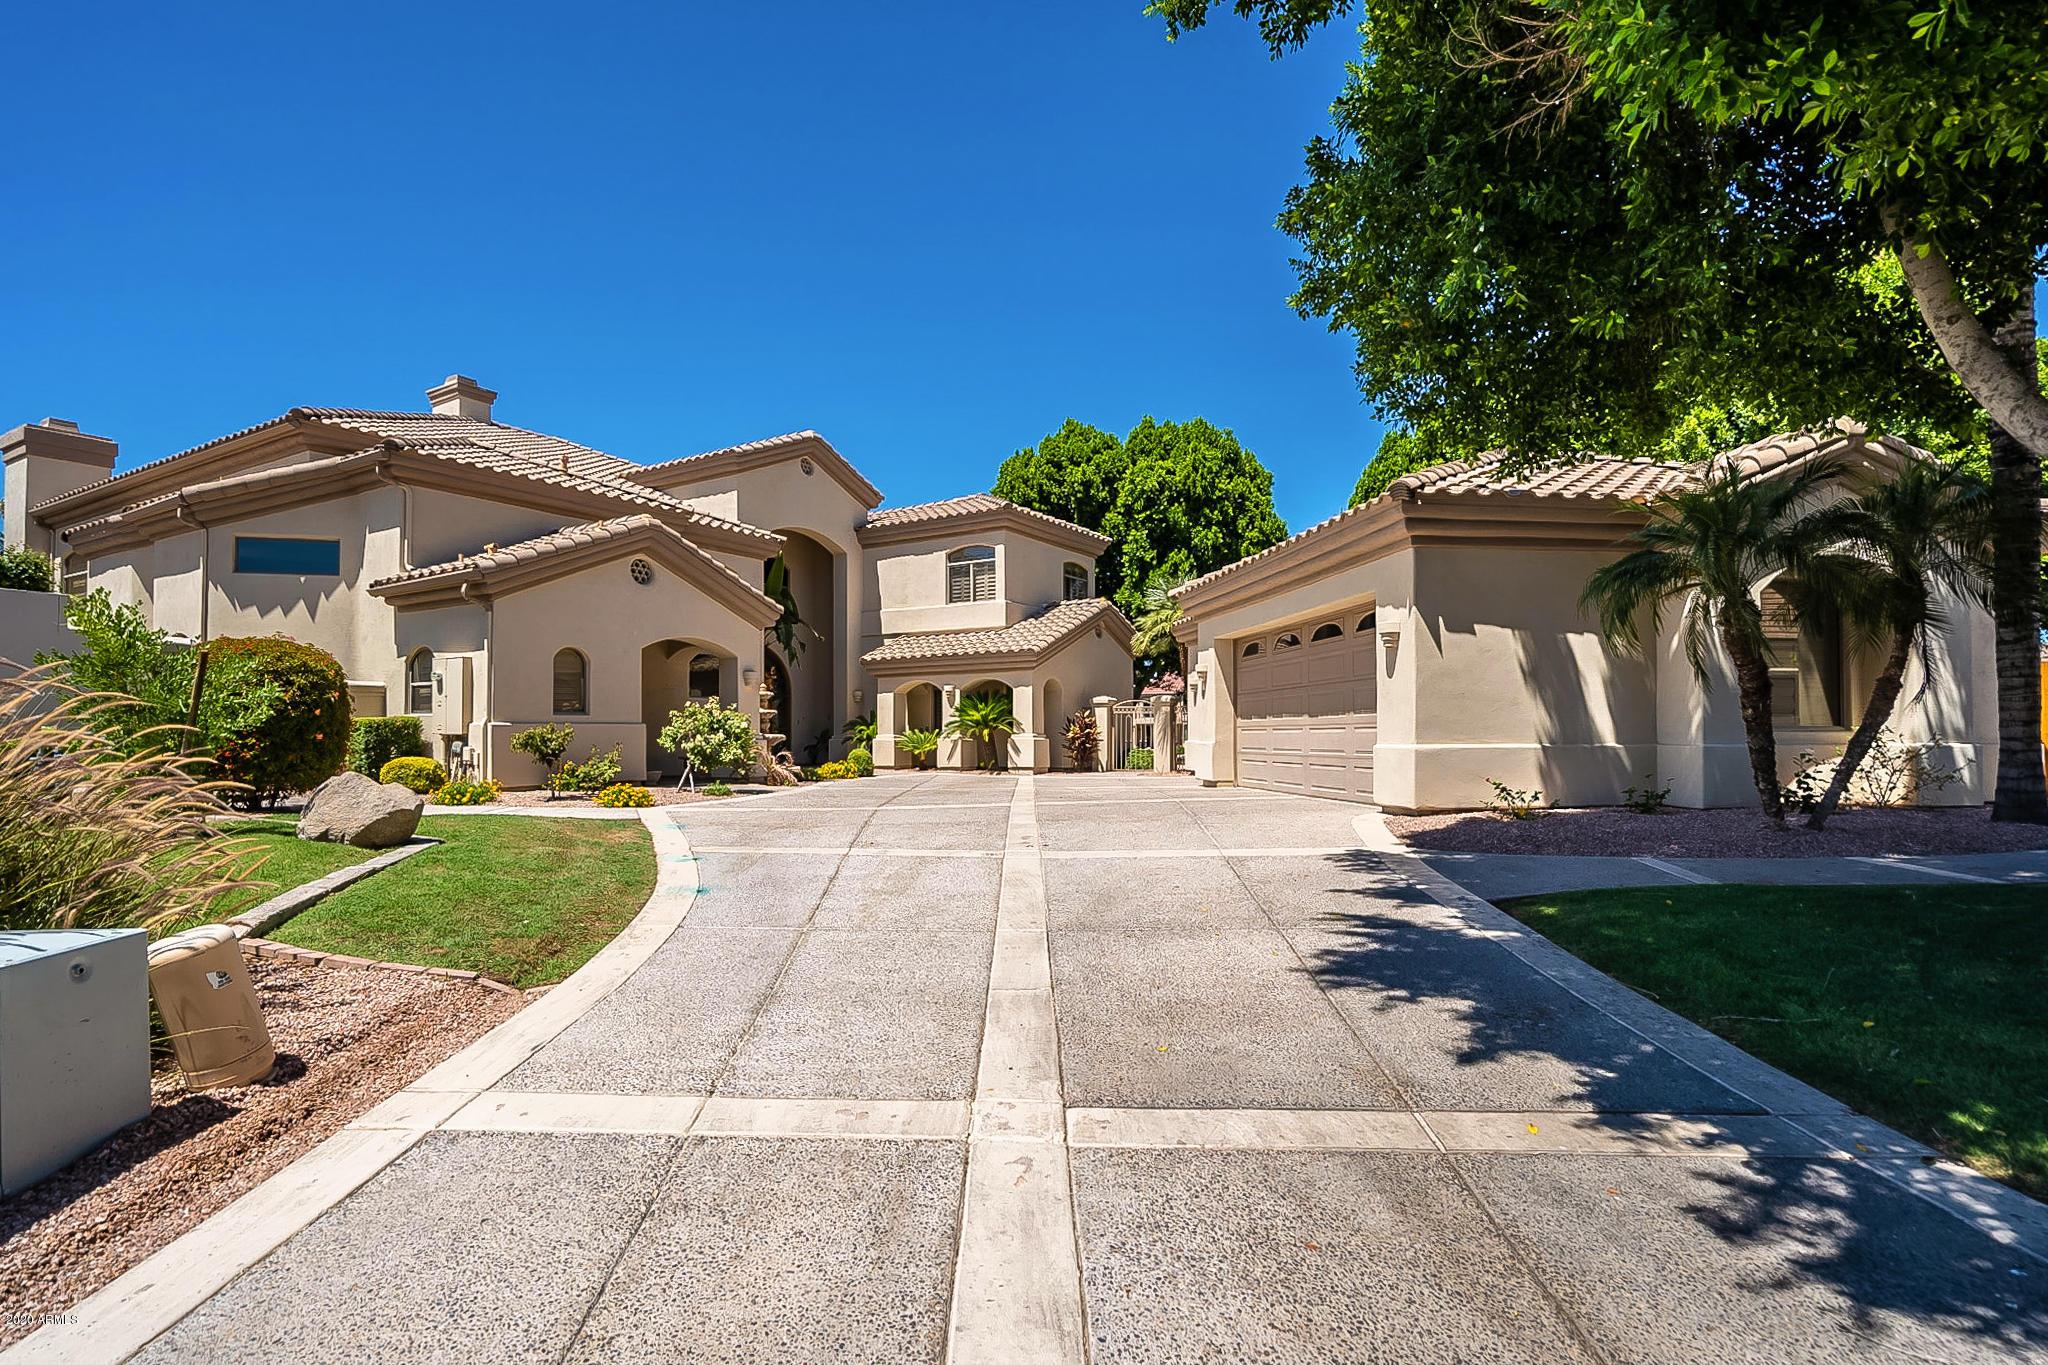 MLS 6091405 Gilbert Metro Area, Gilbert, AZ 85234 Gilbert Homes for Rent